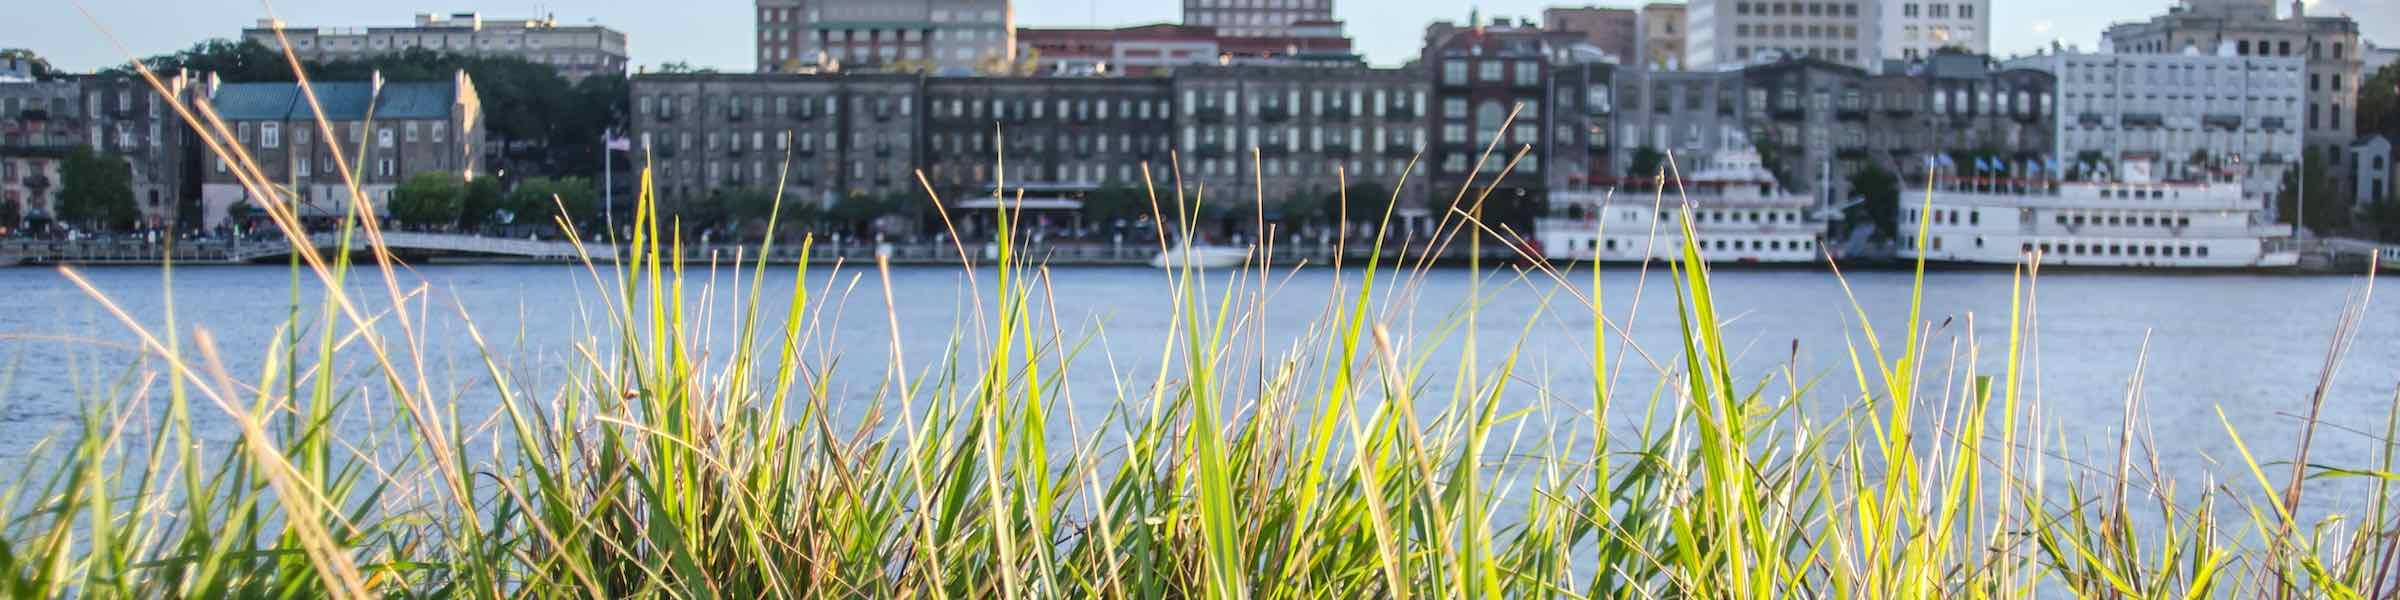 A view of River Street in Savannah through reedy grasses.